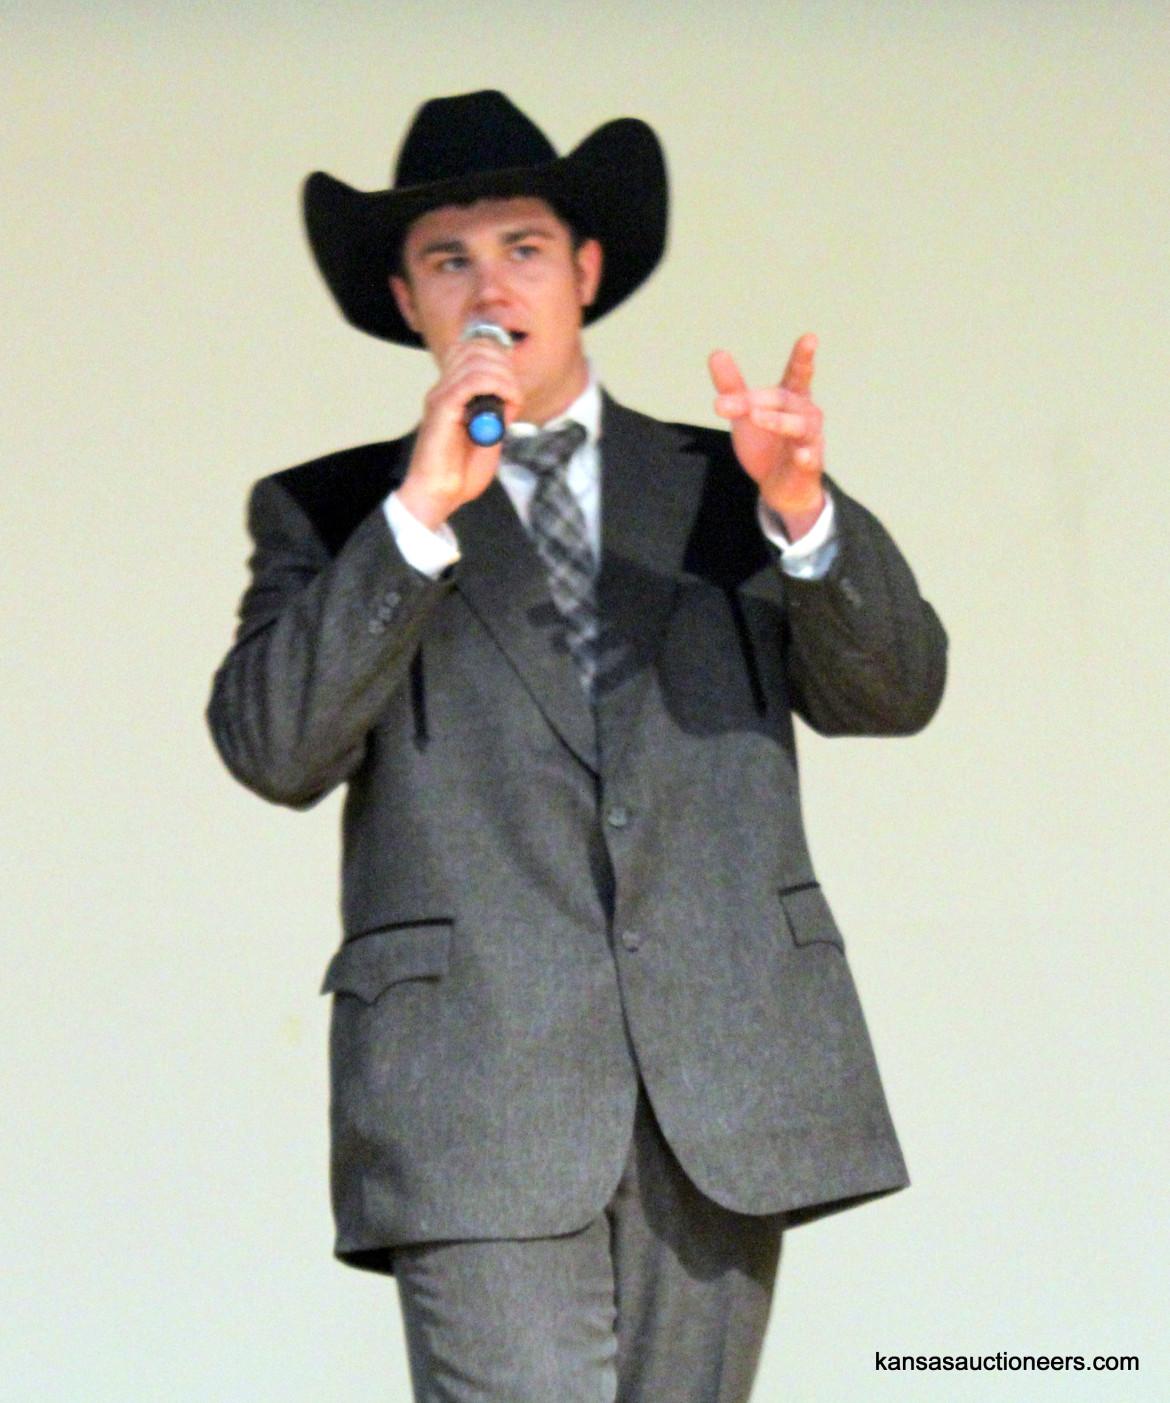 Jase Hubert competing in the 2016 Kansas Auctioneer Preliminaries.